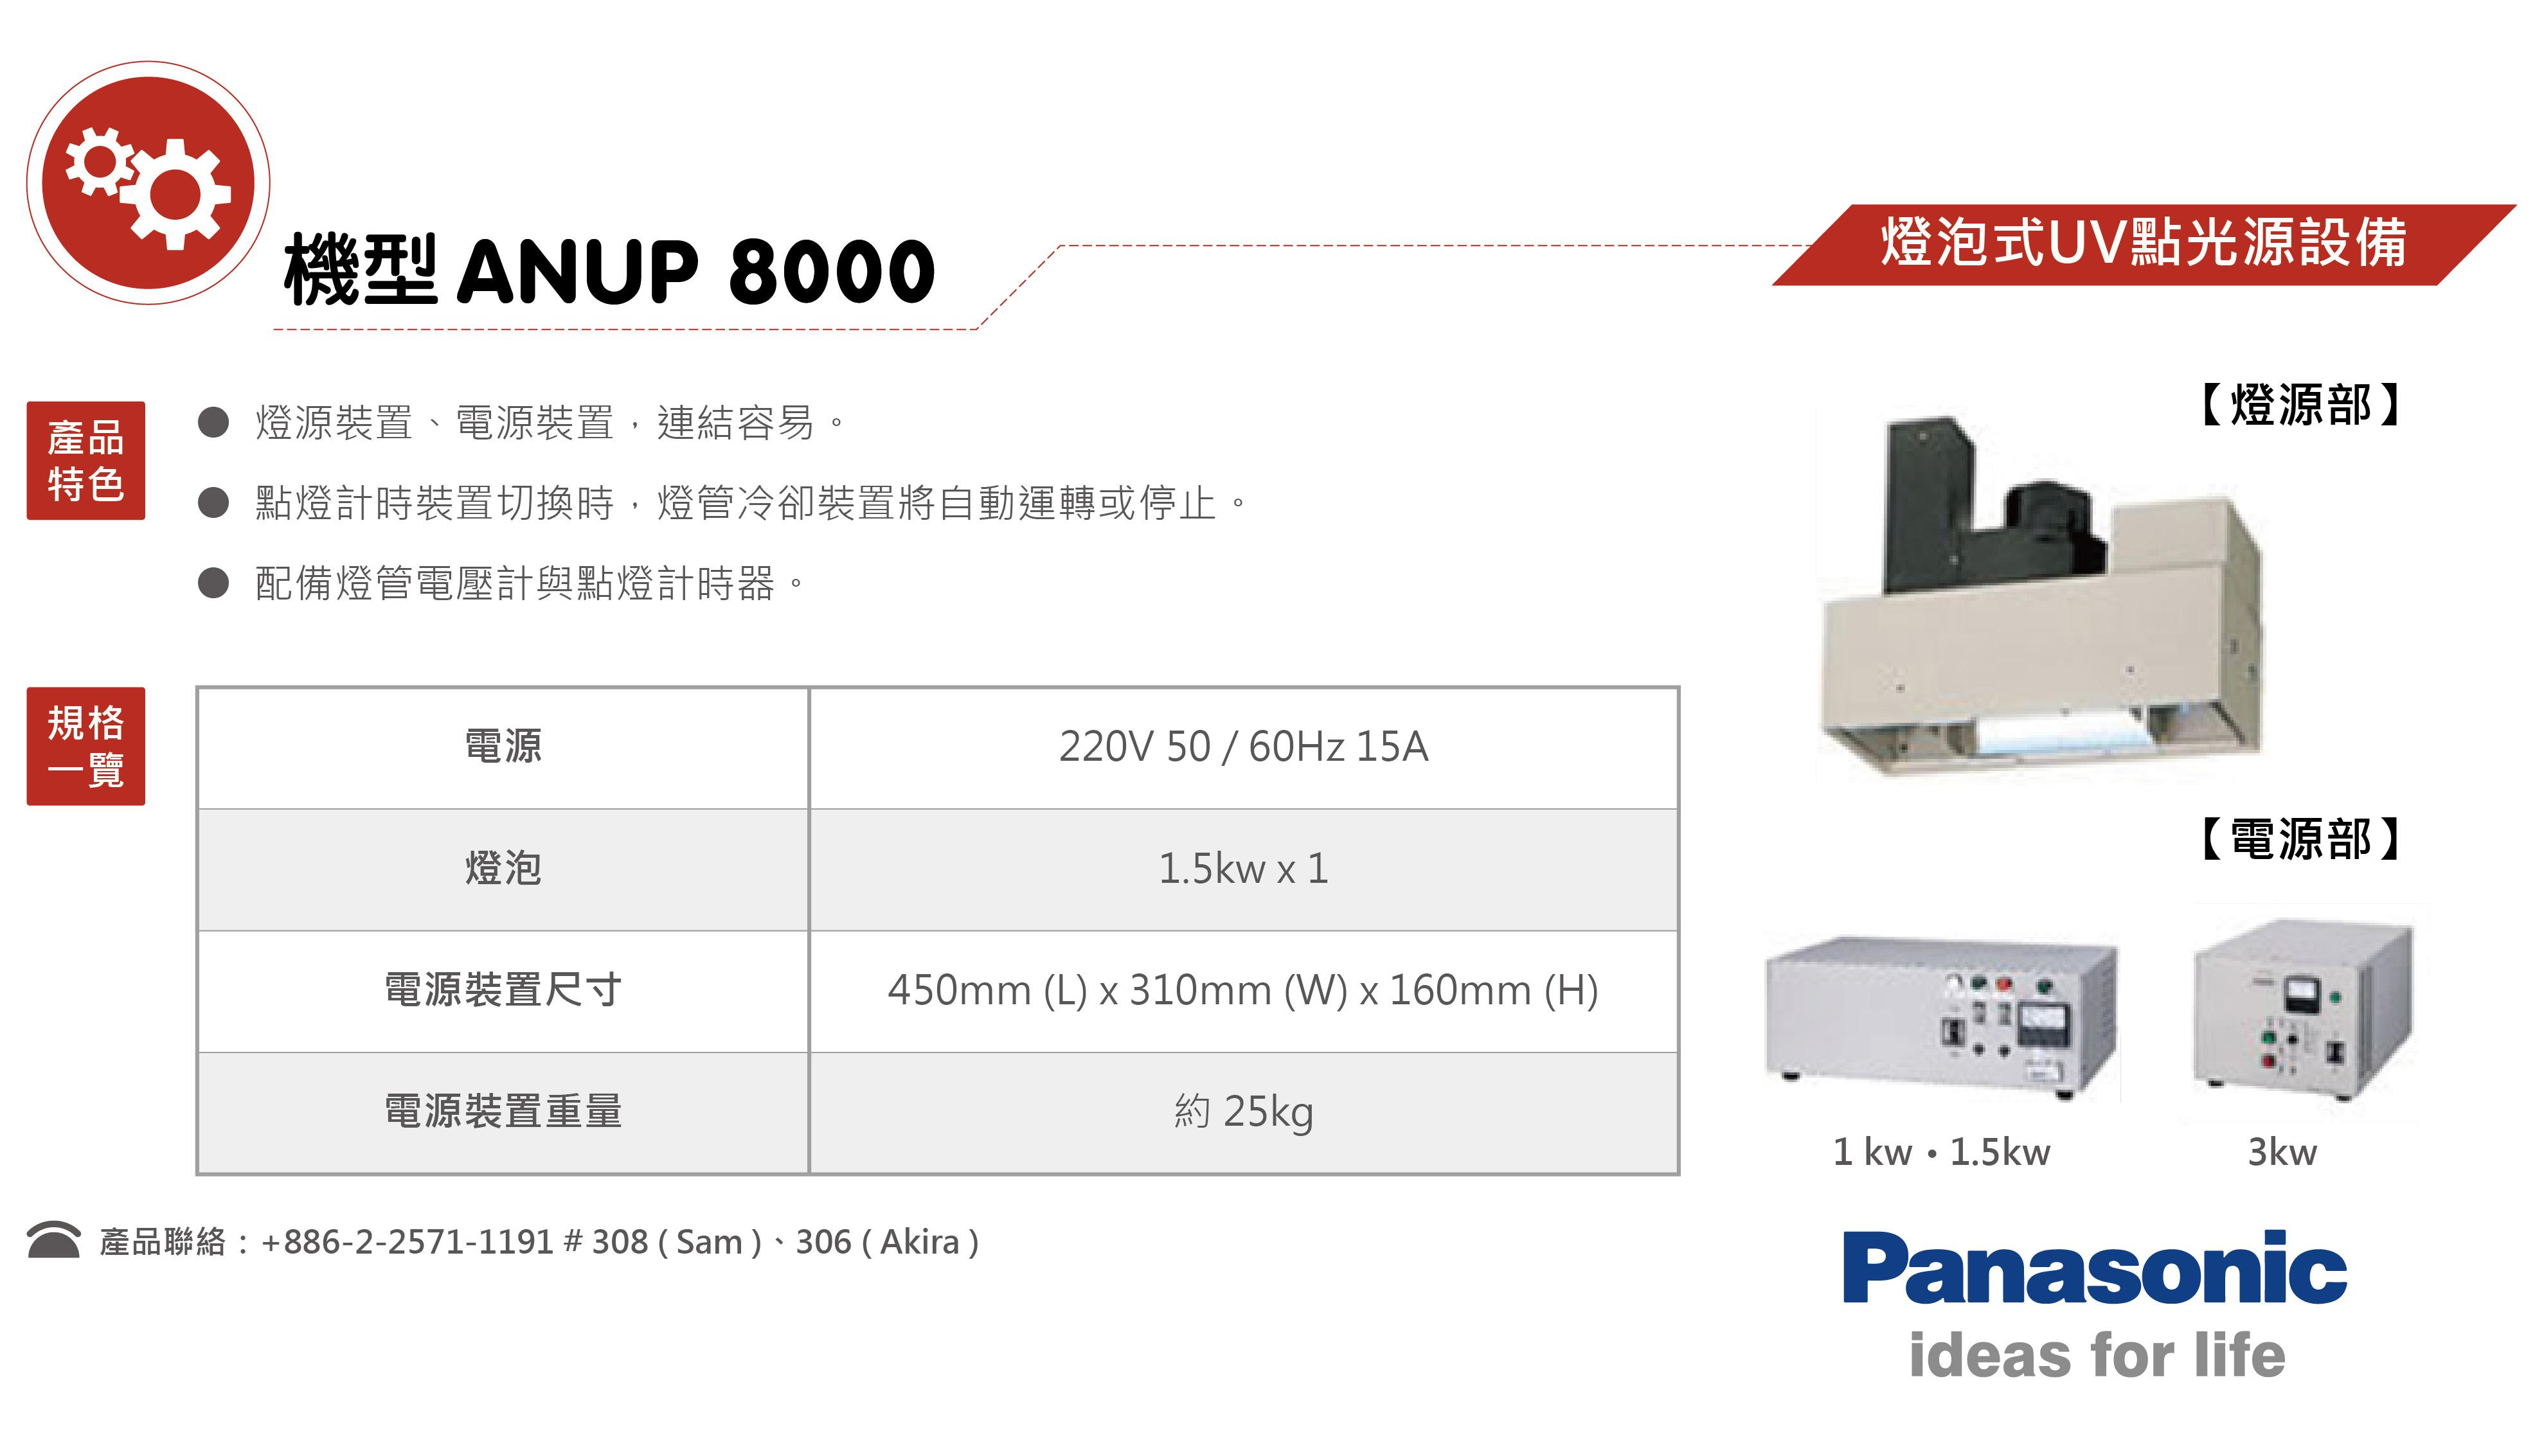 07-UV-輸送帶光源-機型ANUP-3000(UV點光源設備-輸送帶光源)_03